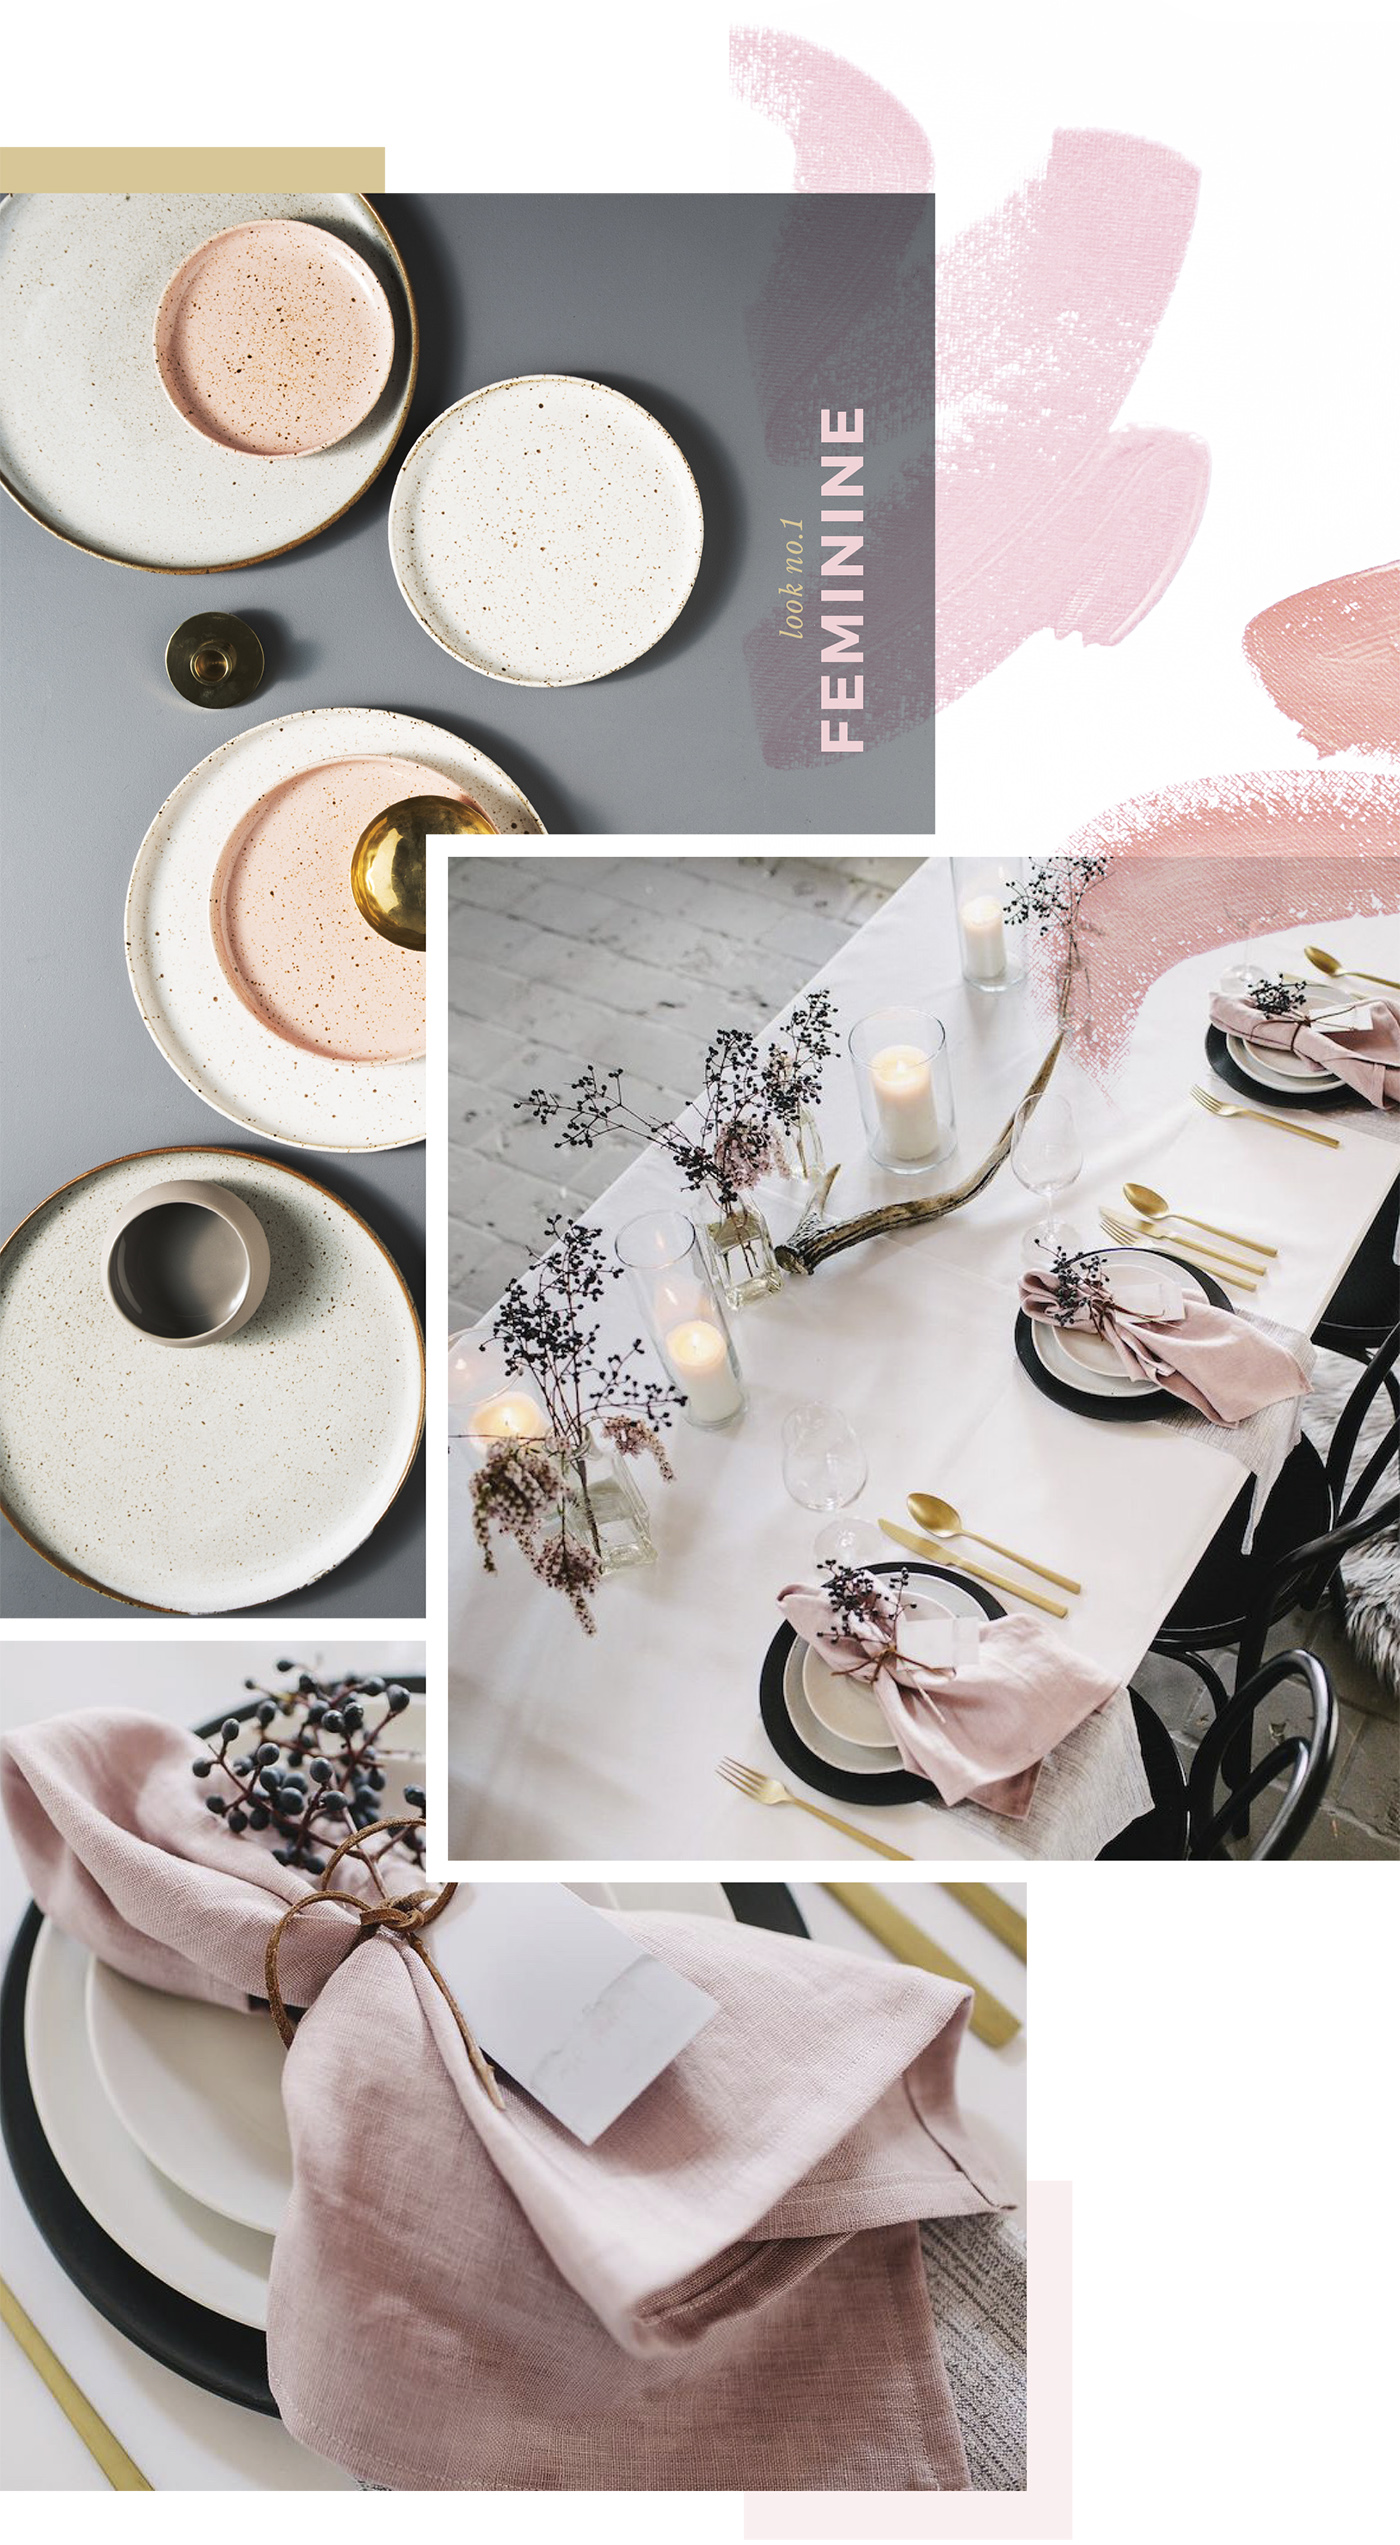 table_setting_styling_idea_pink_feminine_gold_brass_elegant.jpg